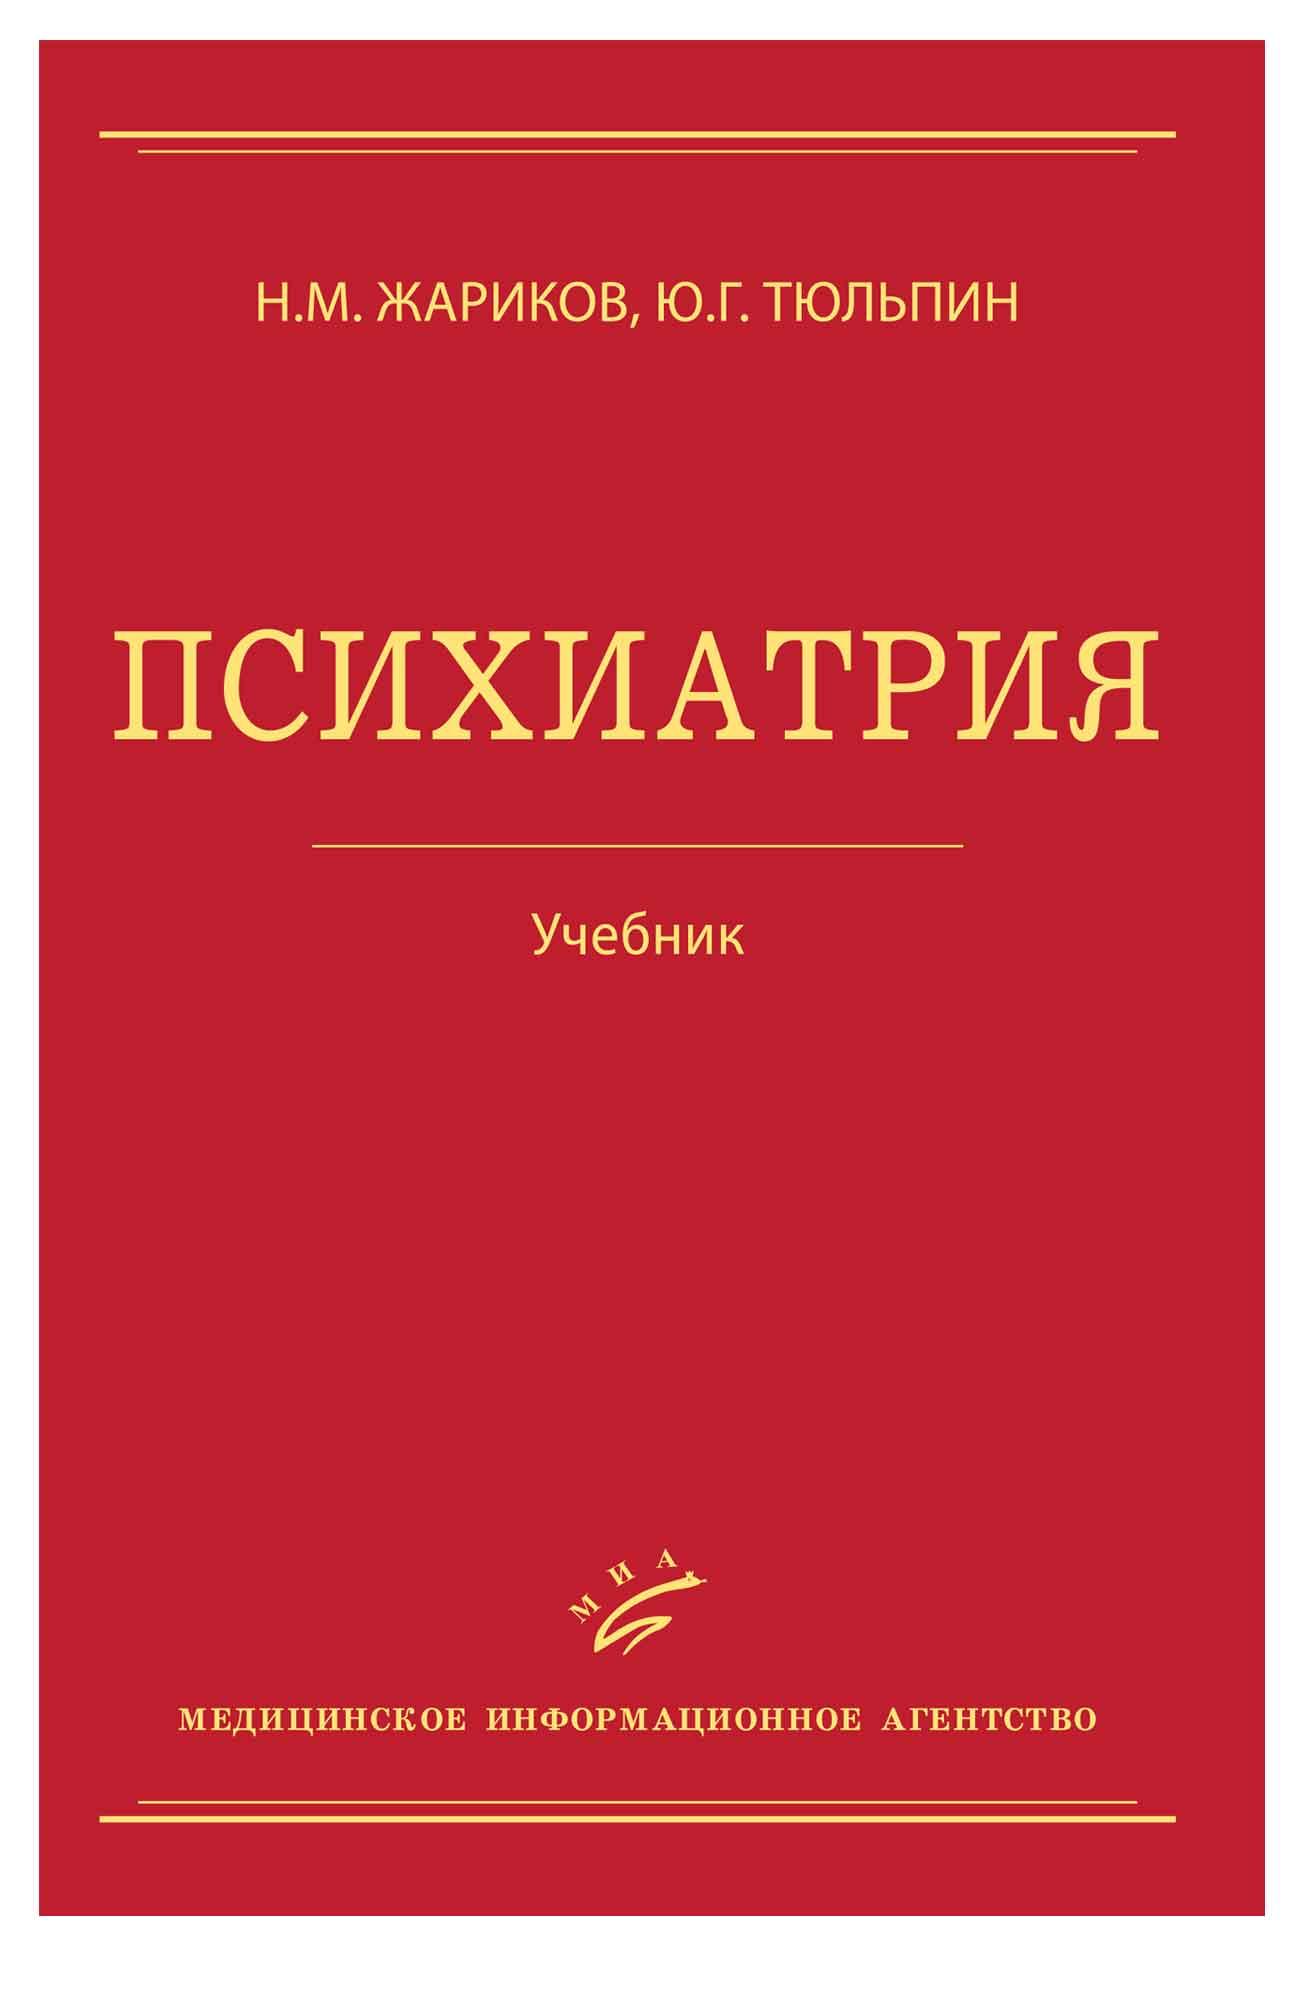 book Vergil\\'s Eclogues